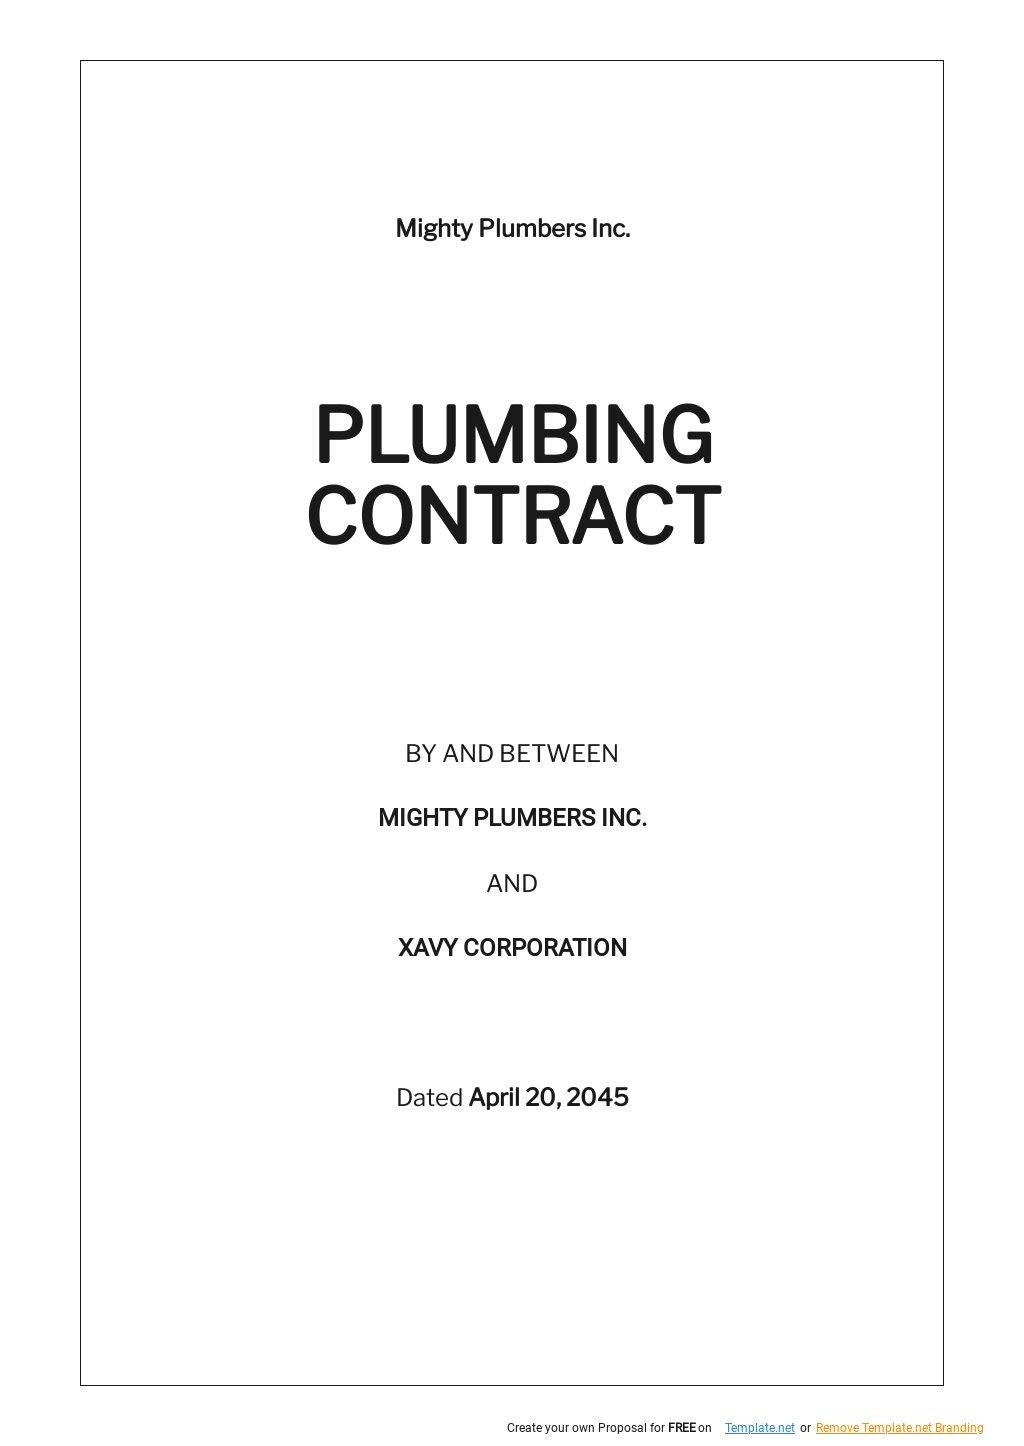 Plumbing Contract Template.jpe